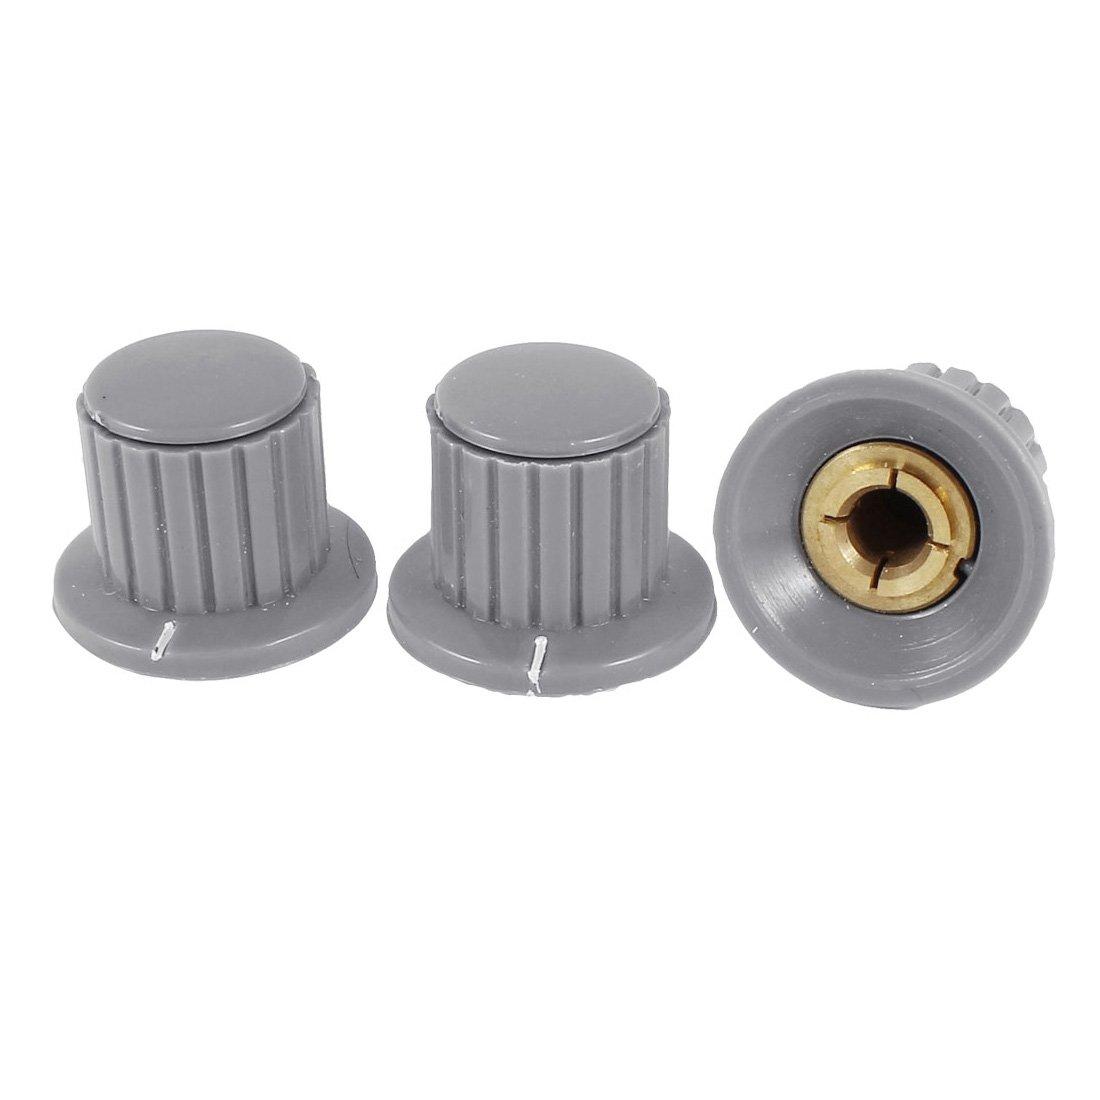 3 Pcs 6mm Hole Diameter Potentiometer Knob Cover Cap 25mmx18mm Gray